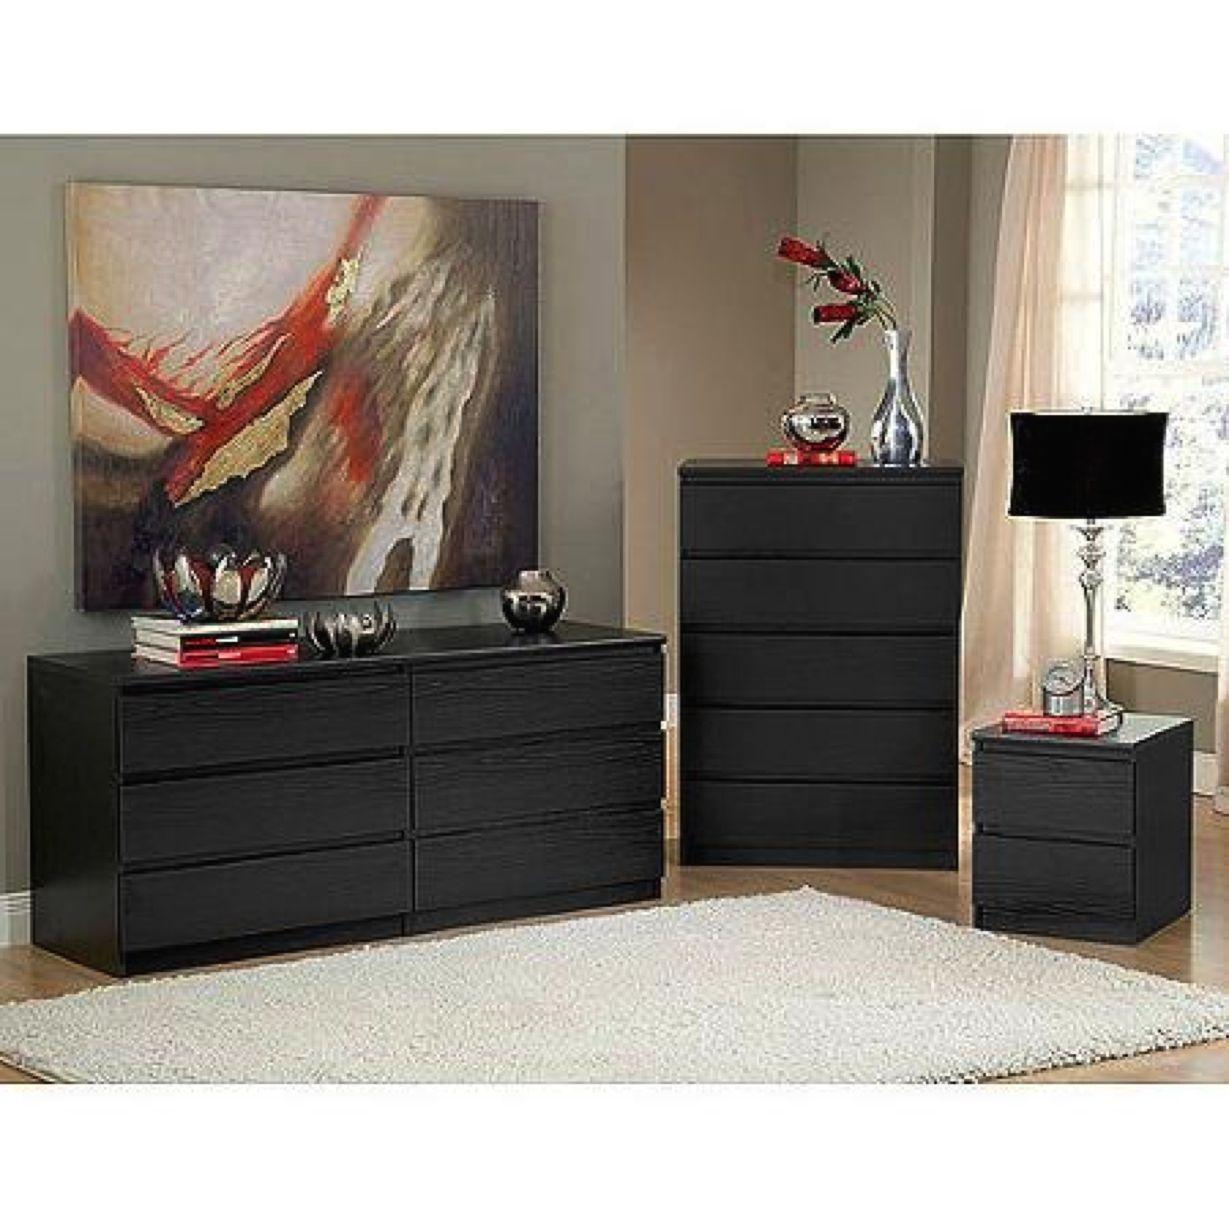 piece dresser nightstand chest of drawers black modern bedroom sets